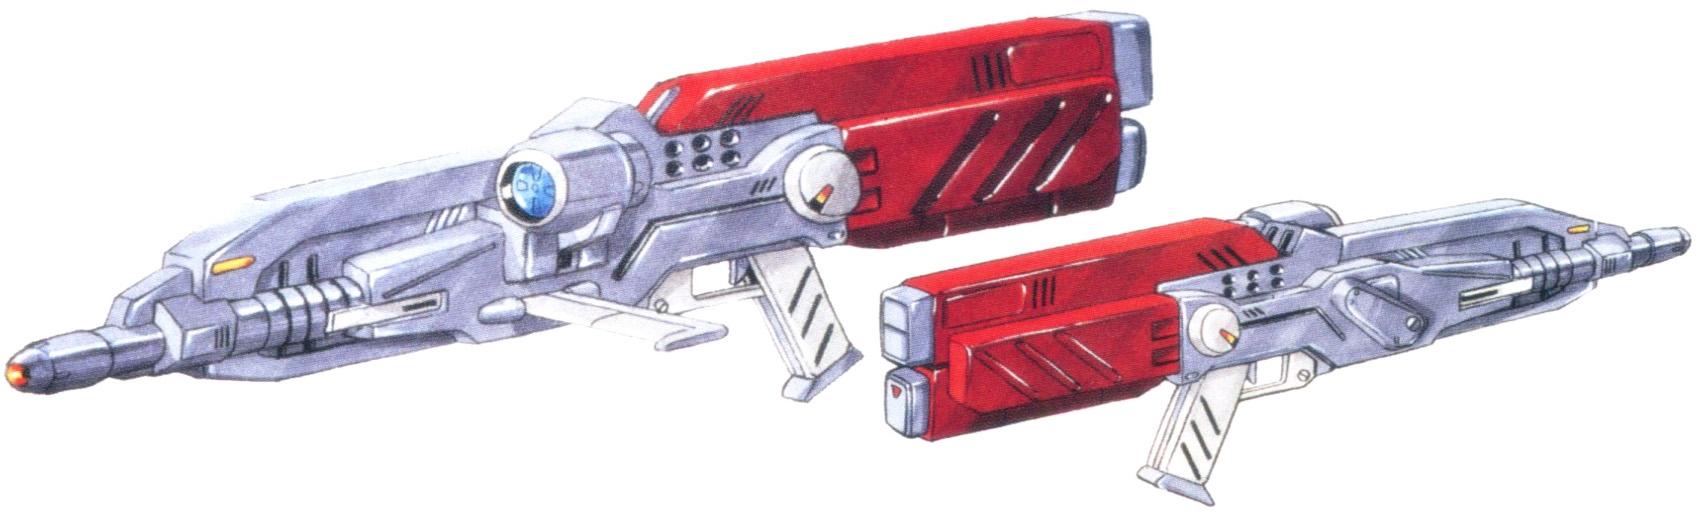 File:Rx-78-7-beamrifle.jpg